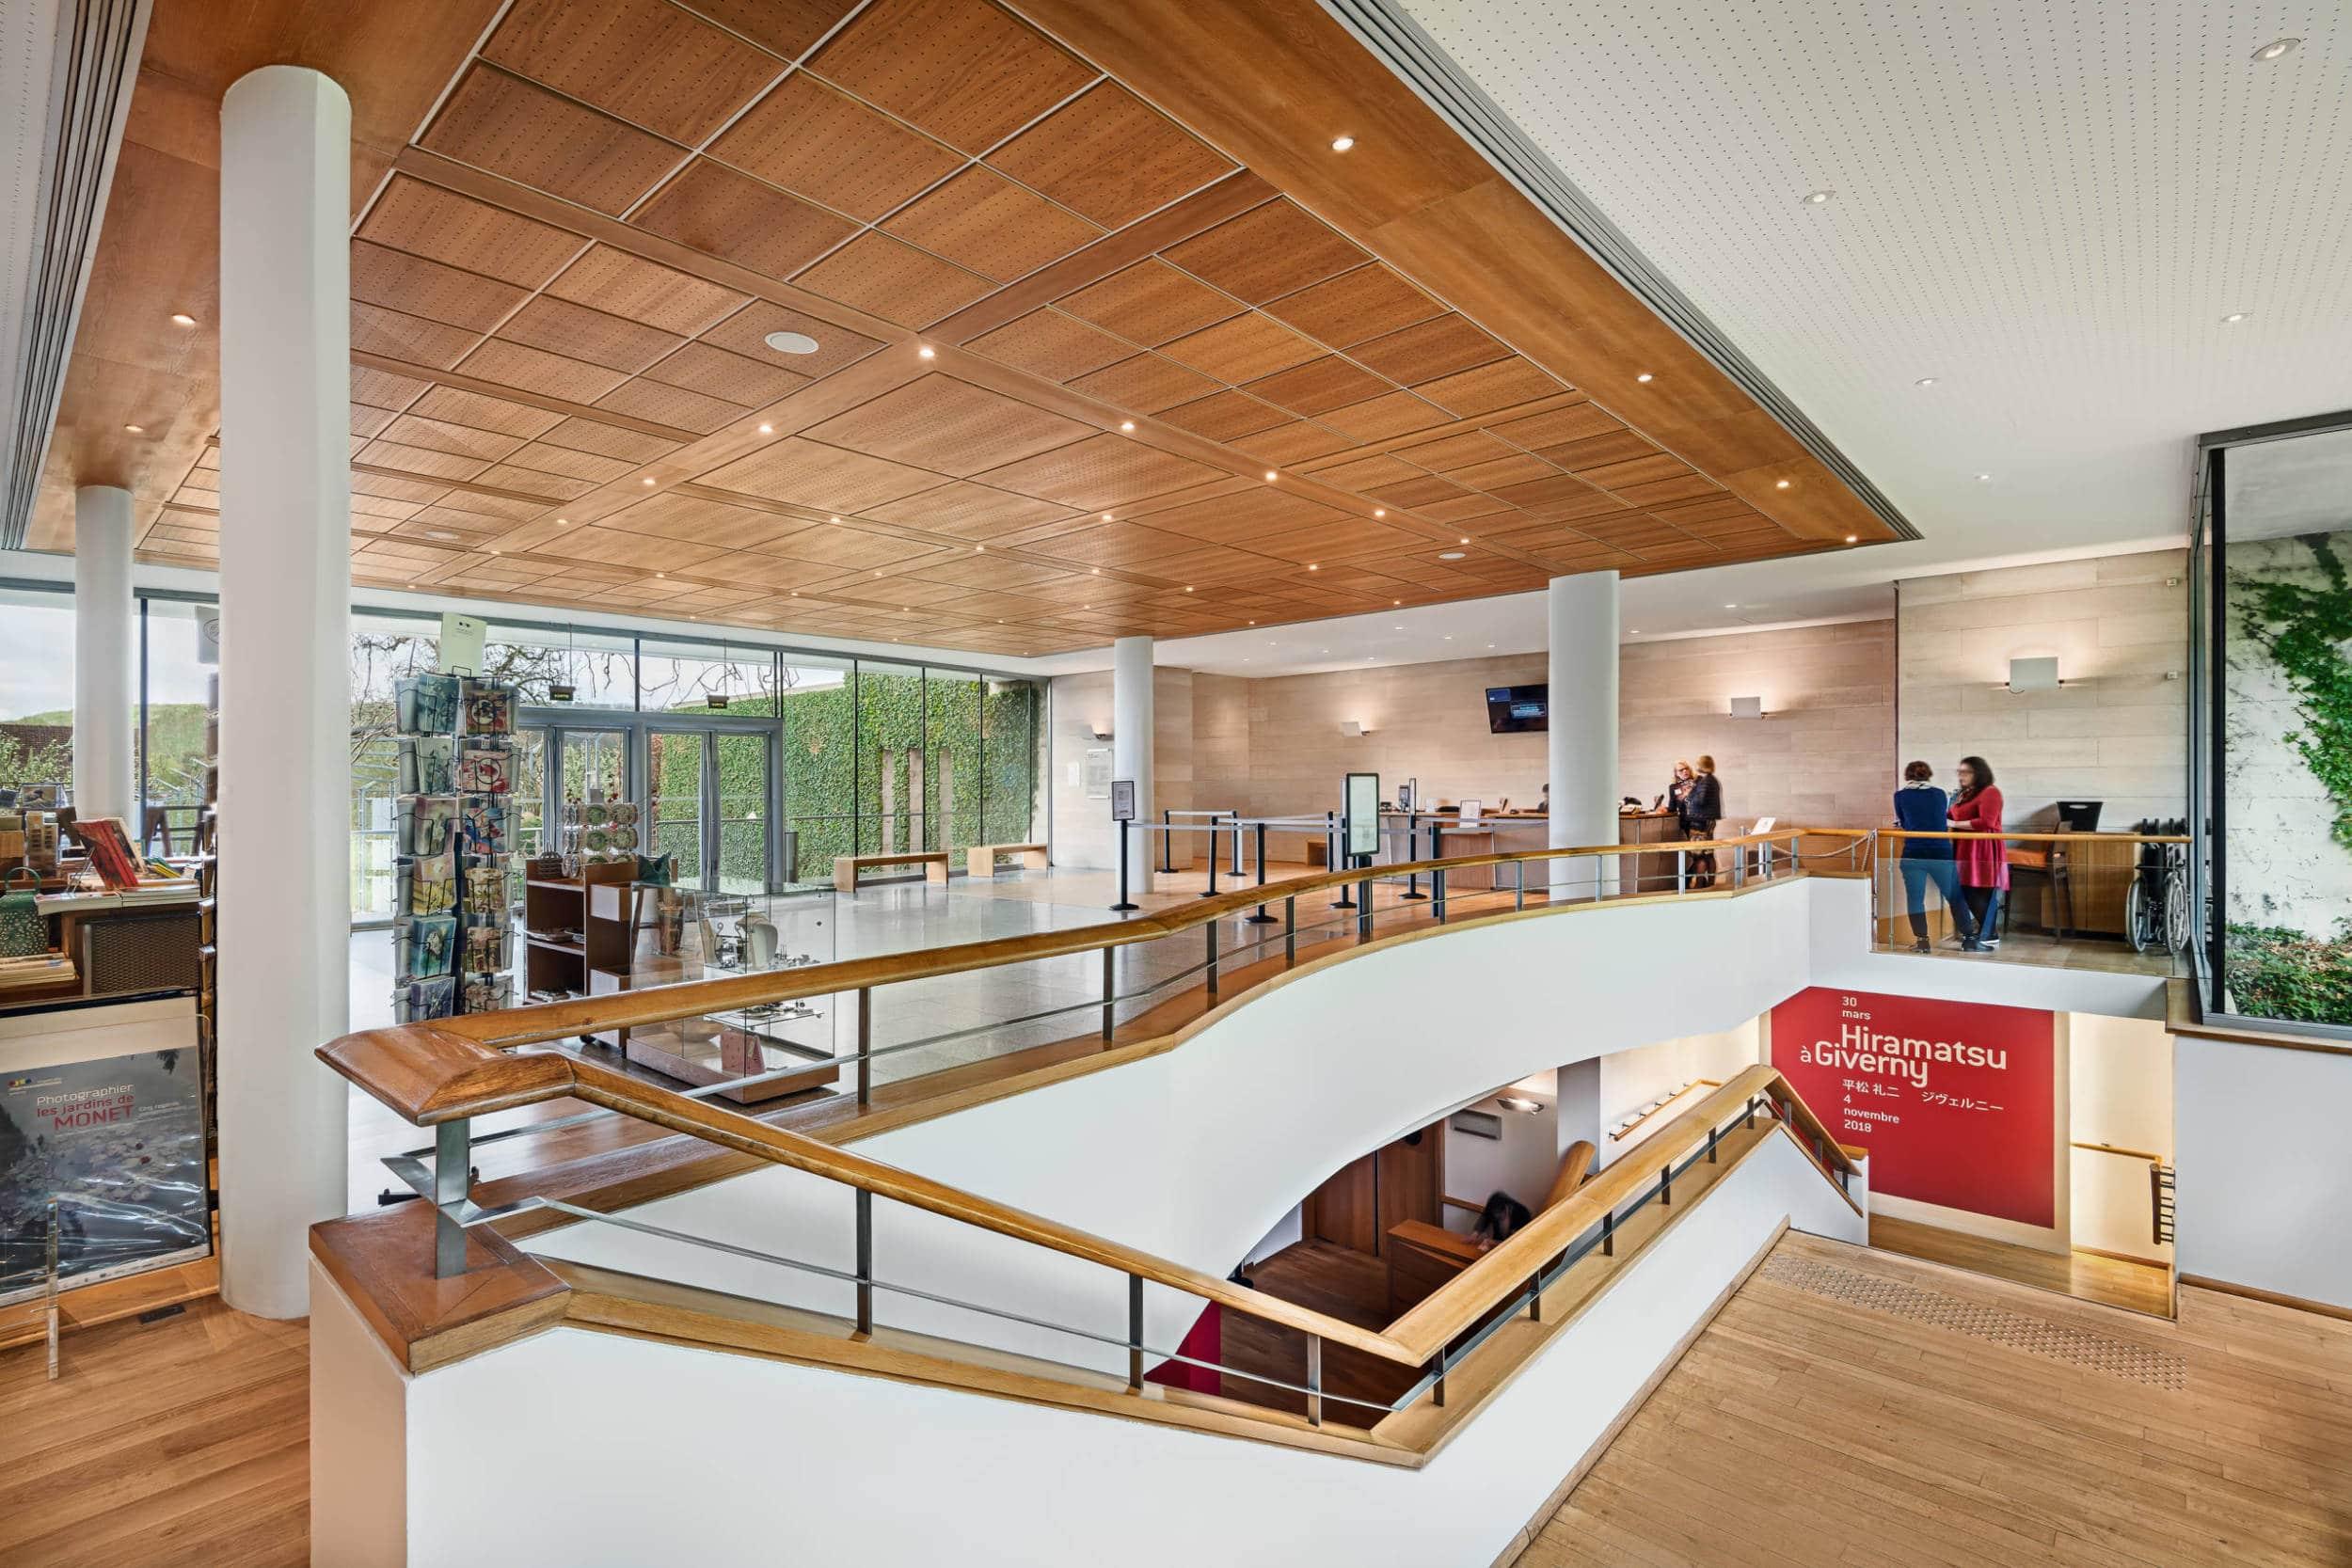 Hall du musée des impressionnismes Giverny